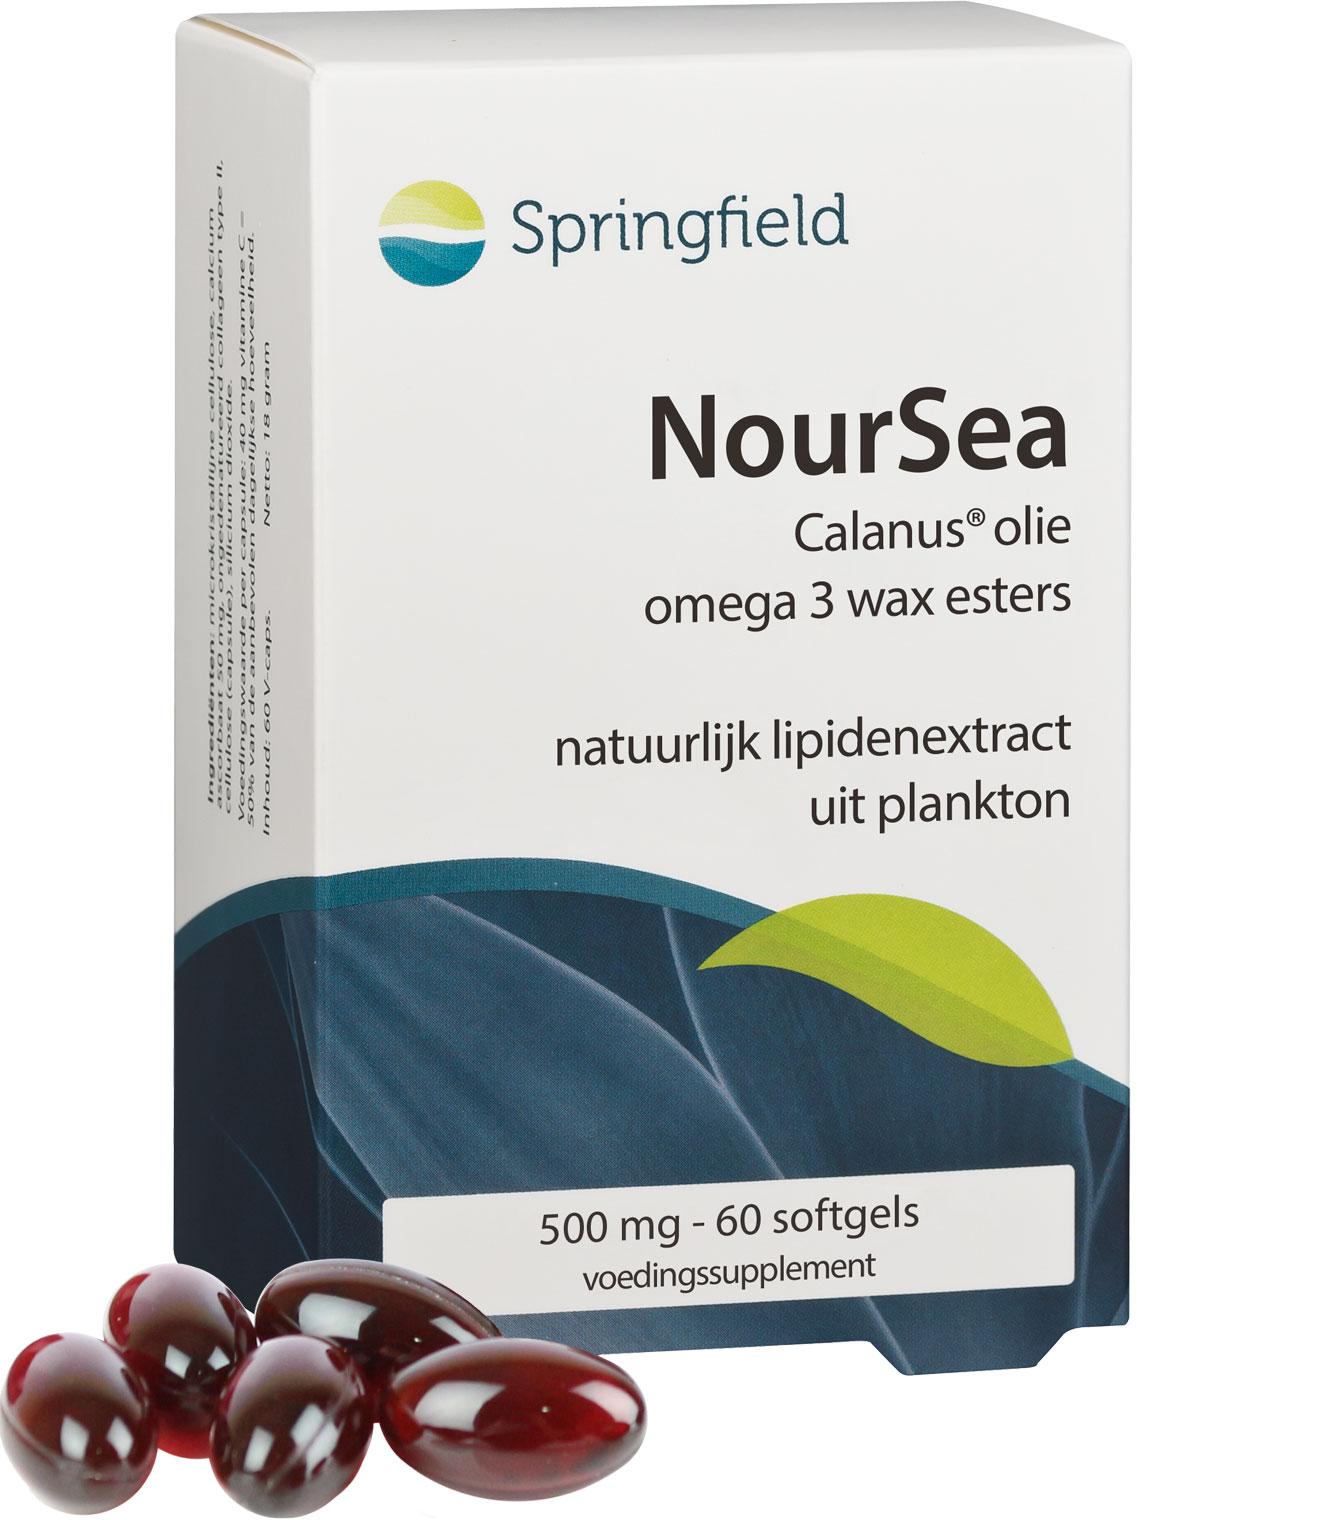 Noursea Calanus olie - omega 3 wax esters